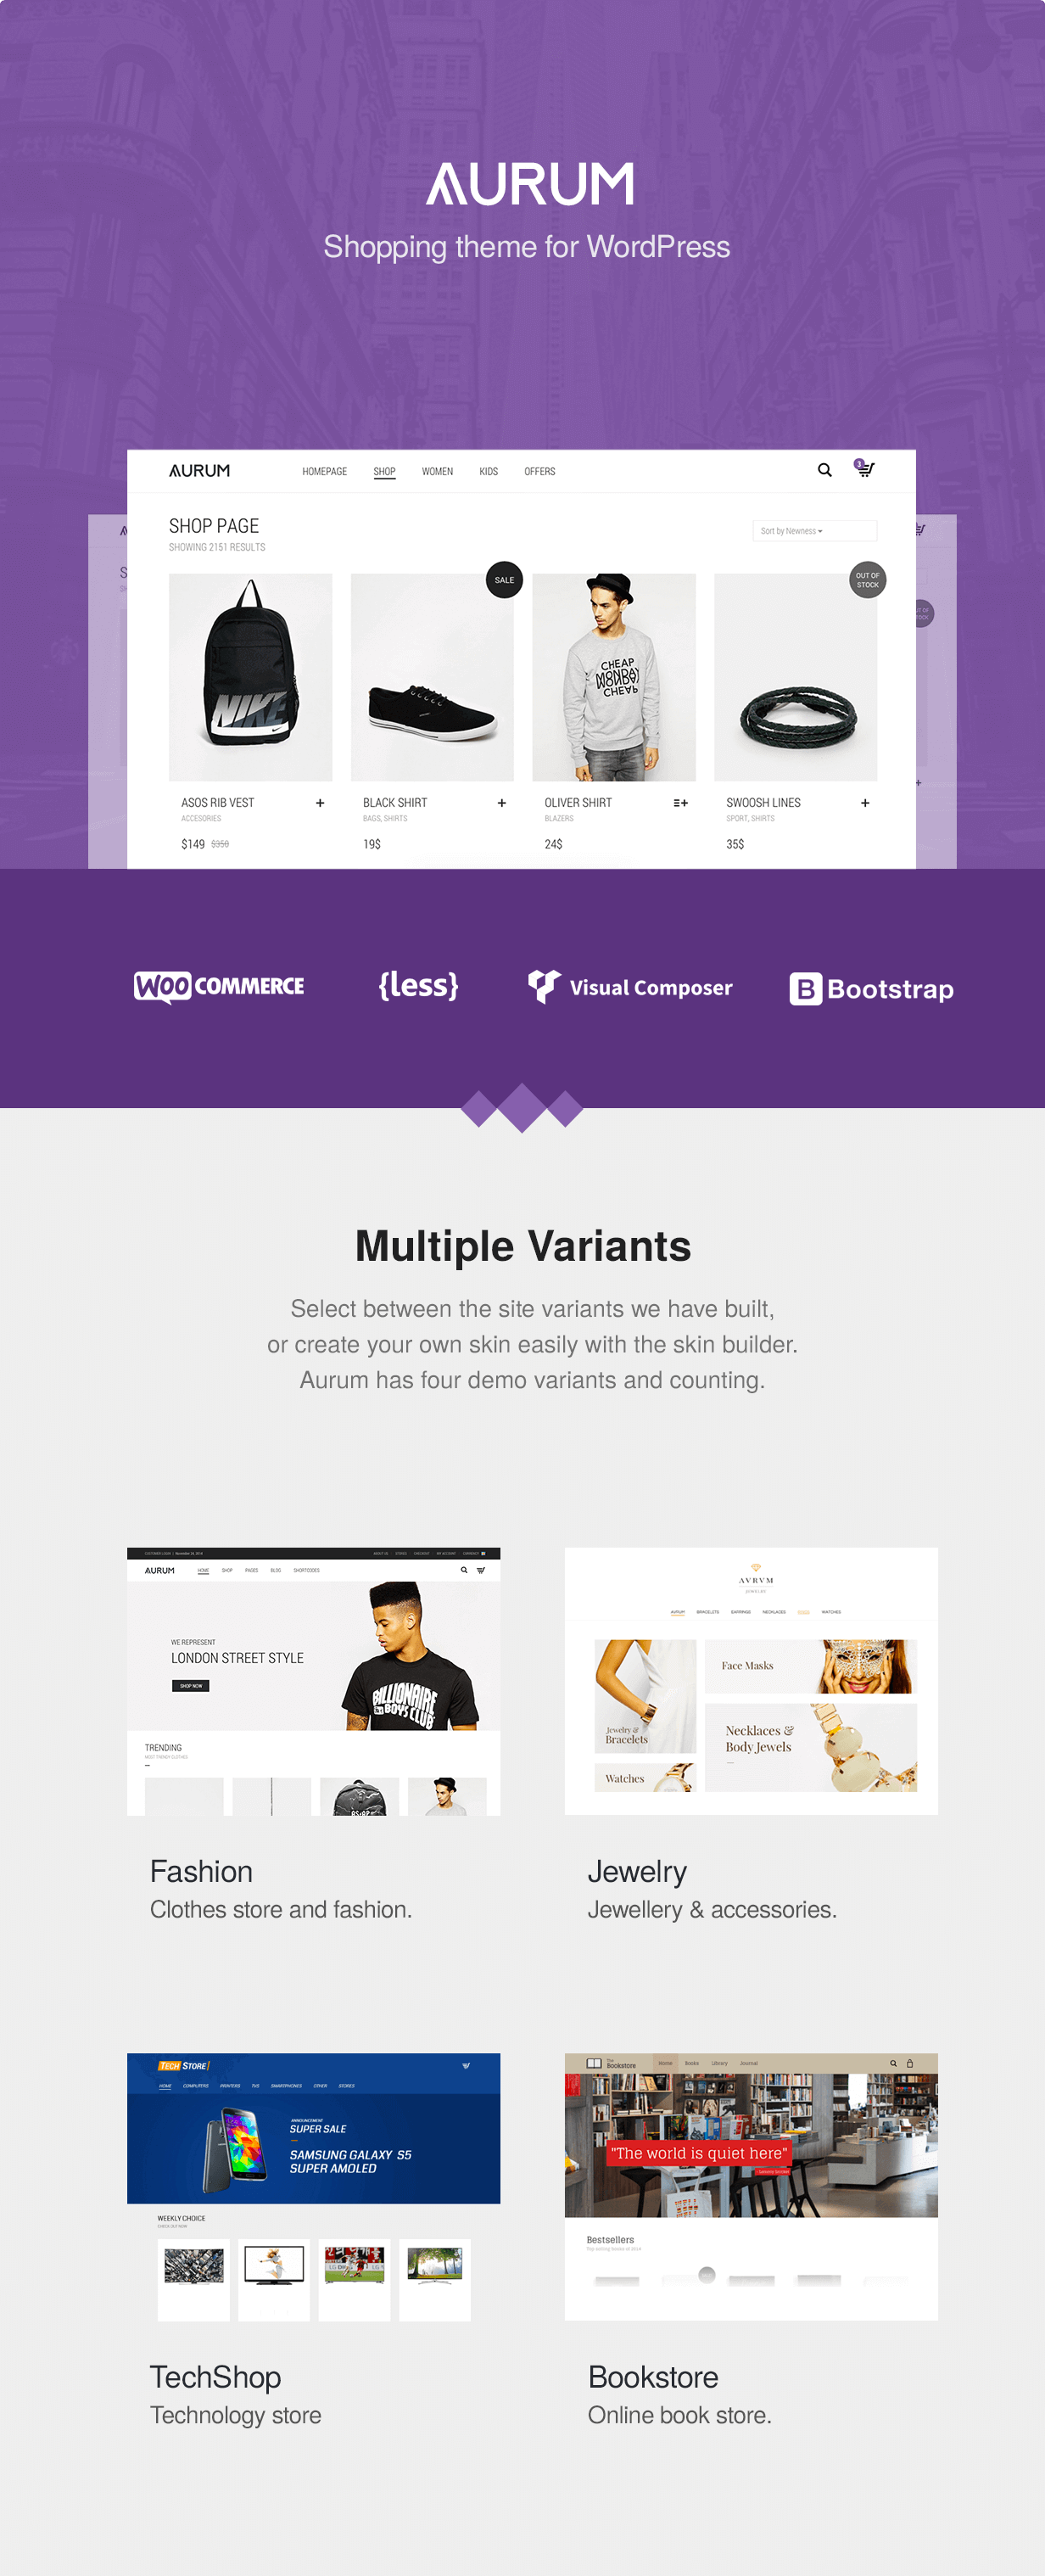 aurum2 - Aurum - Minimalist Shopping Theme